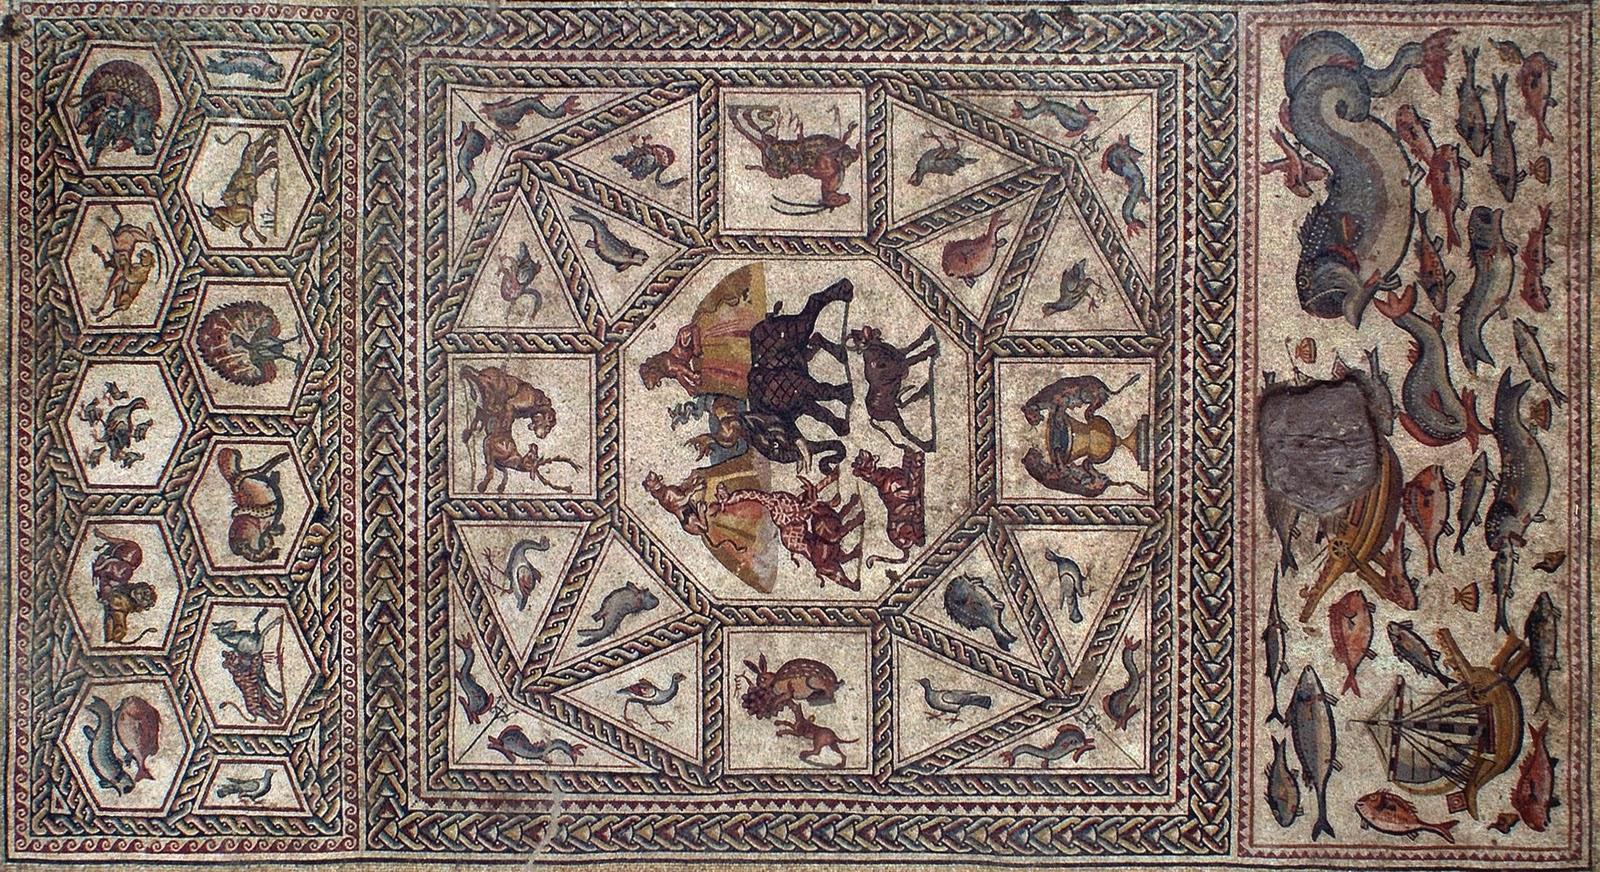 Mountshang Roman Mosaic Floor From Lod